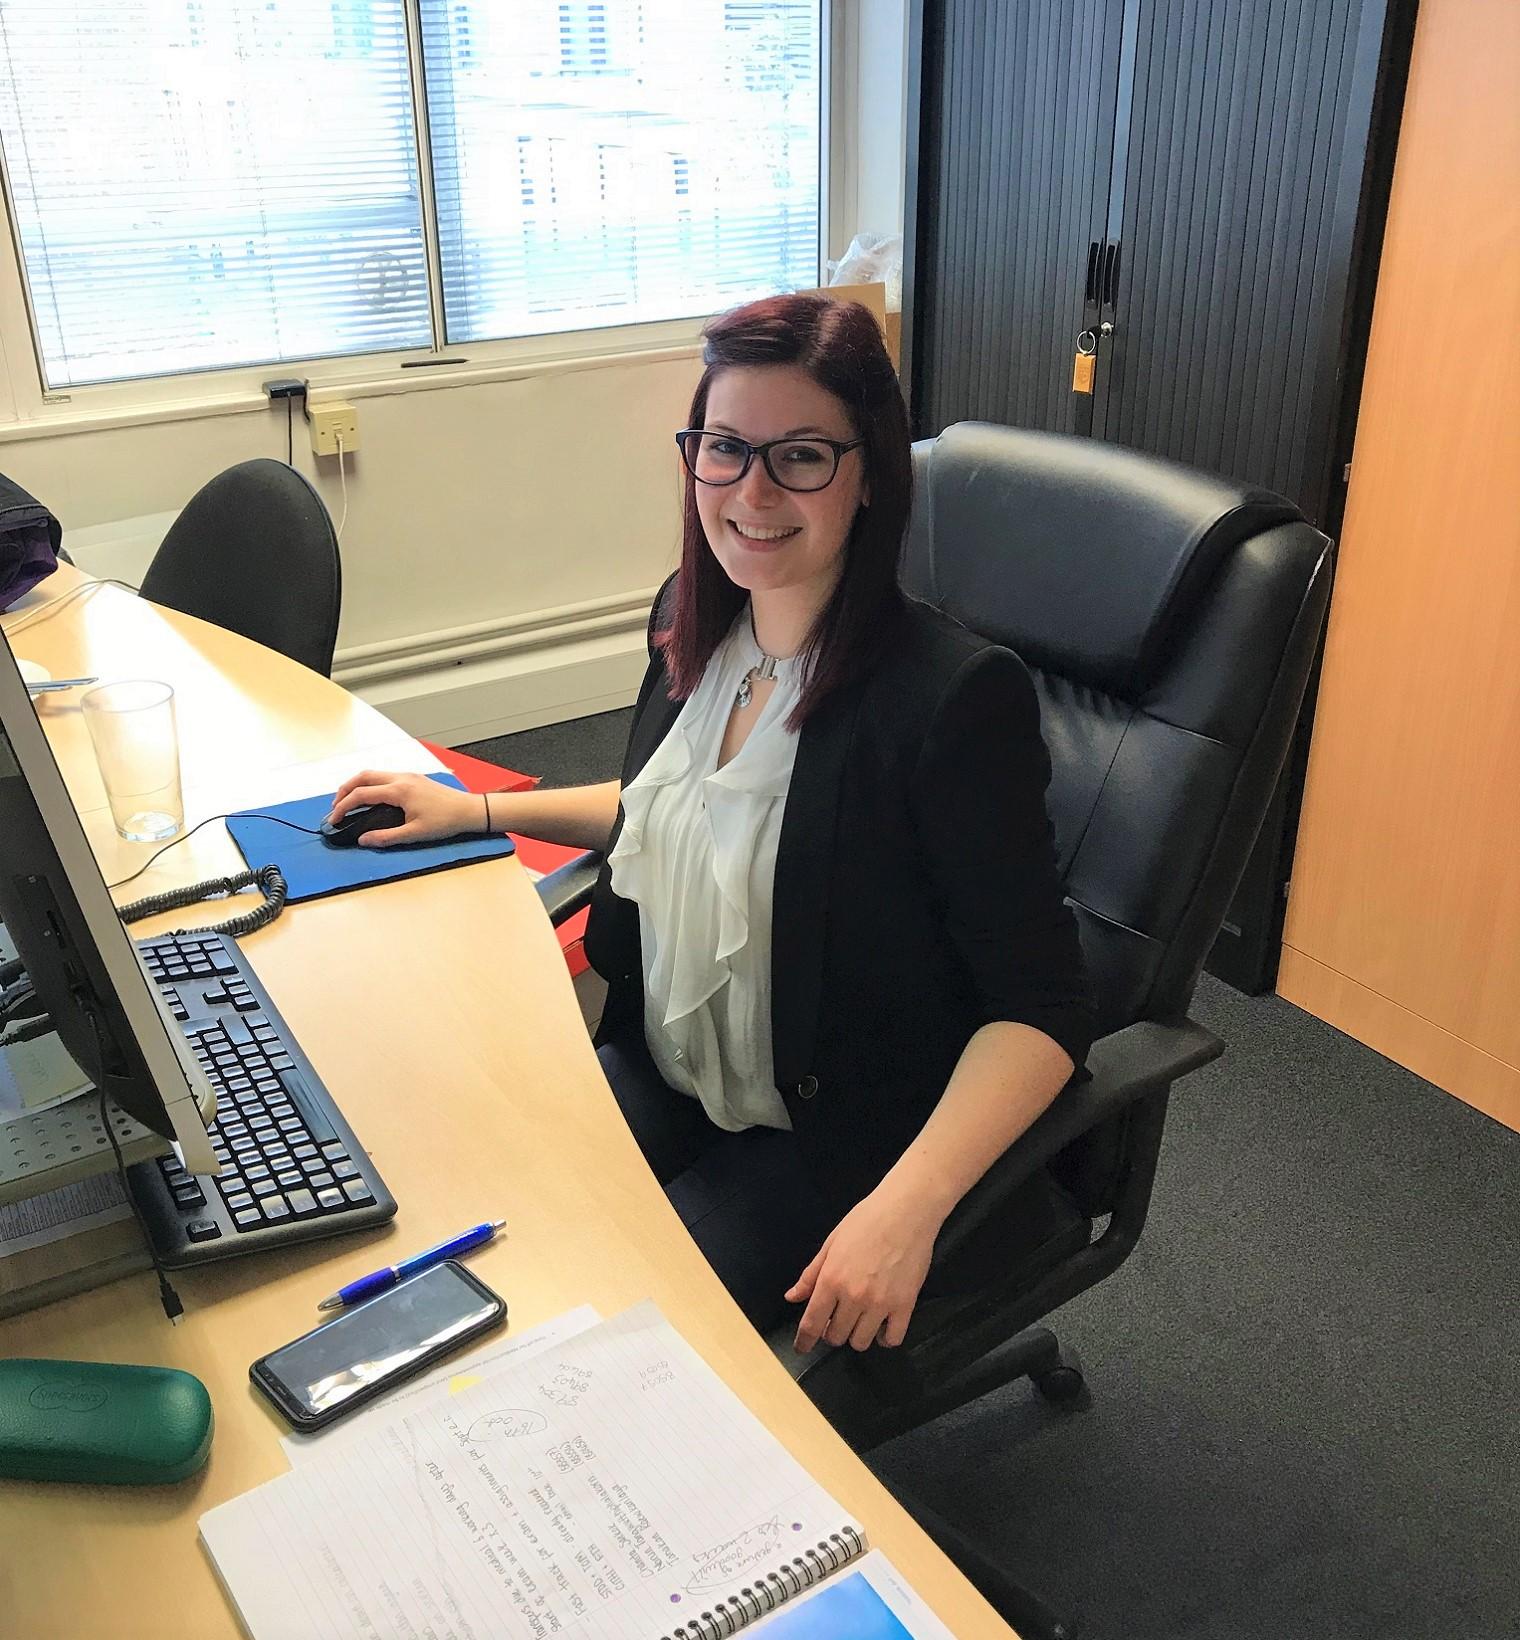 meet-the-team-cth-assessments-coordinator-rebecca-lauder-article-img